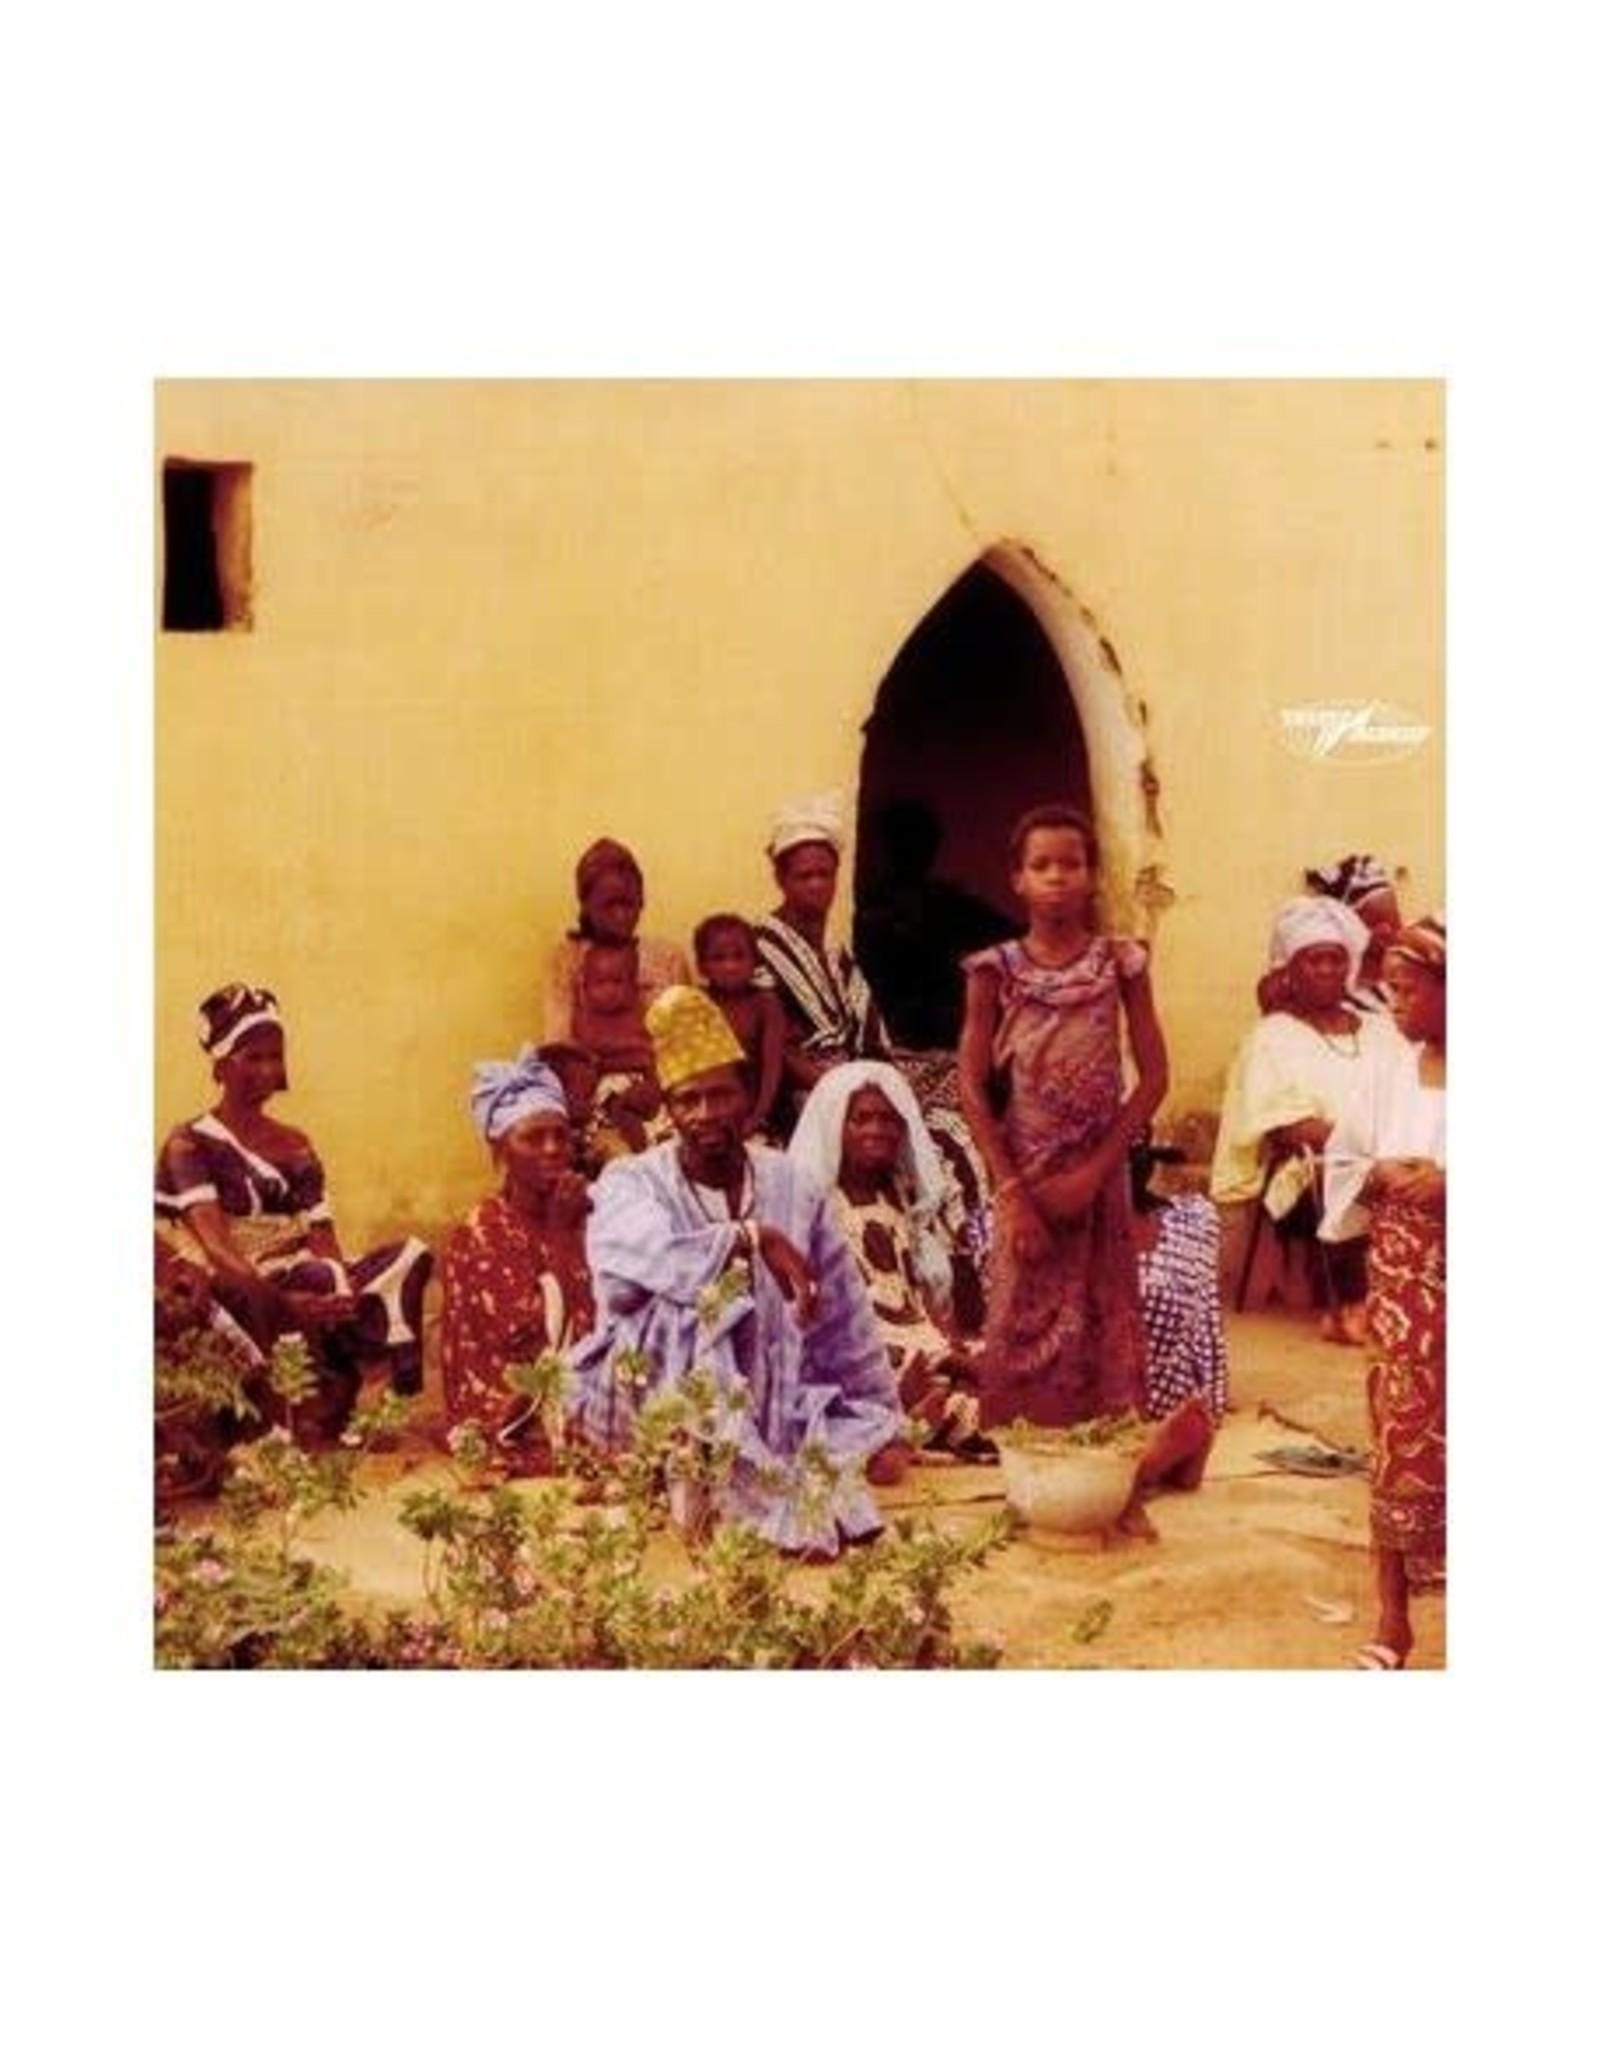 New Vinyl Ali Farka Touré - Red A LP